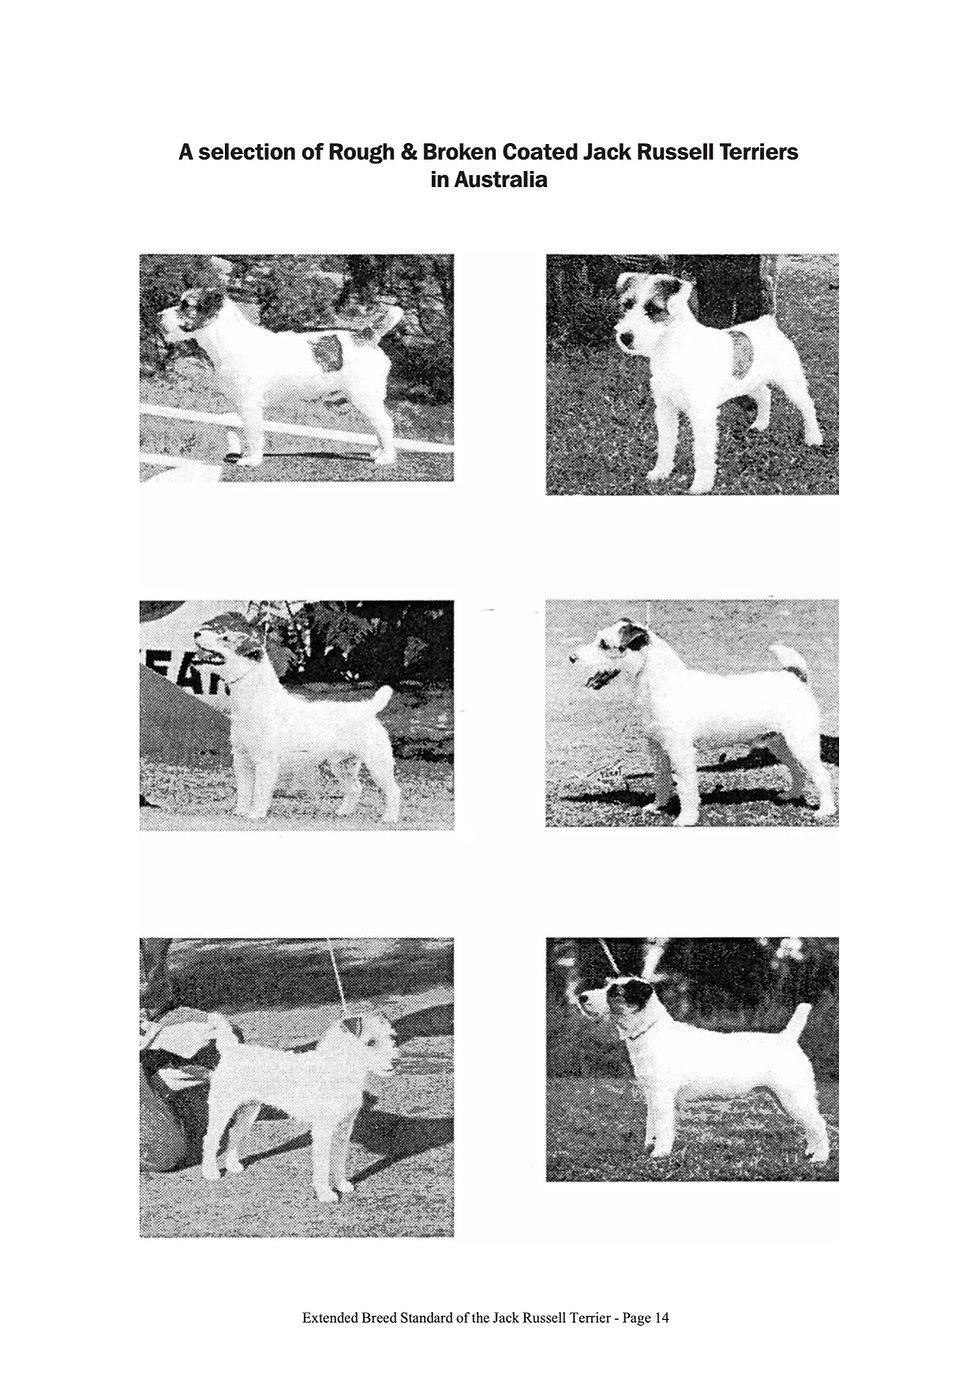 liTnni-Extended_Breed_Standard14.jpg